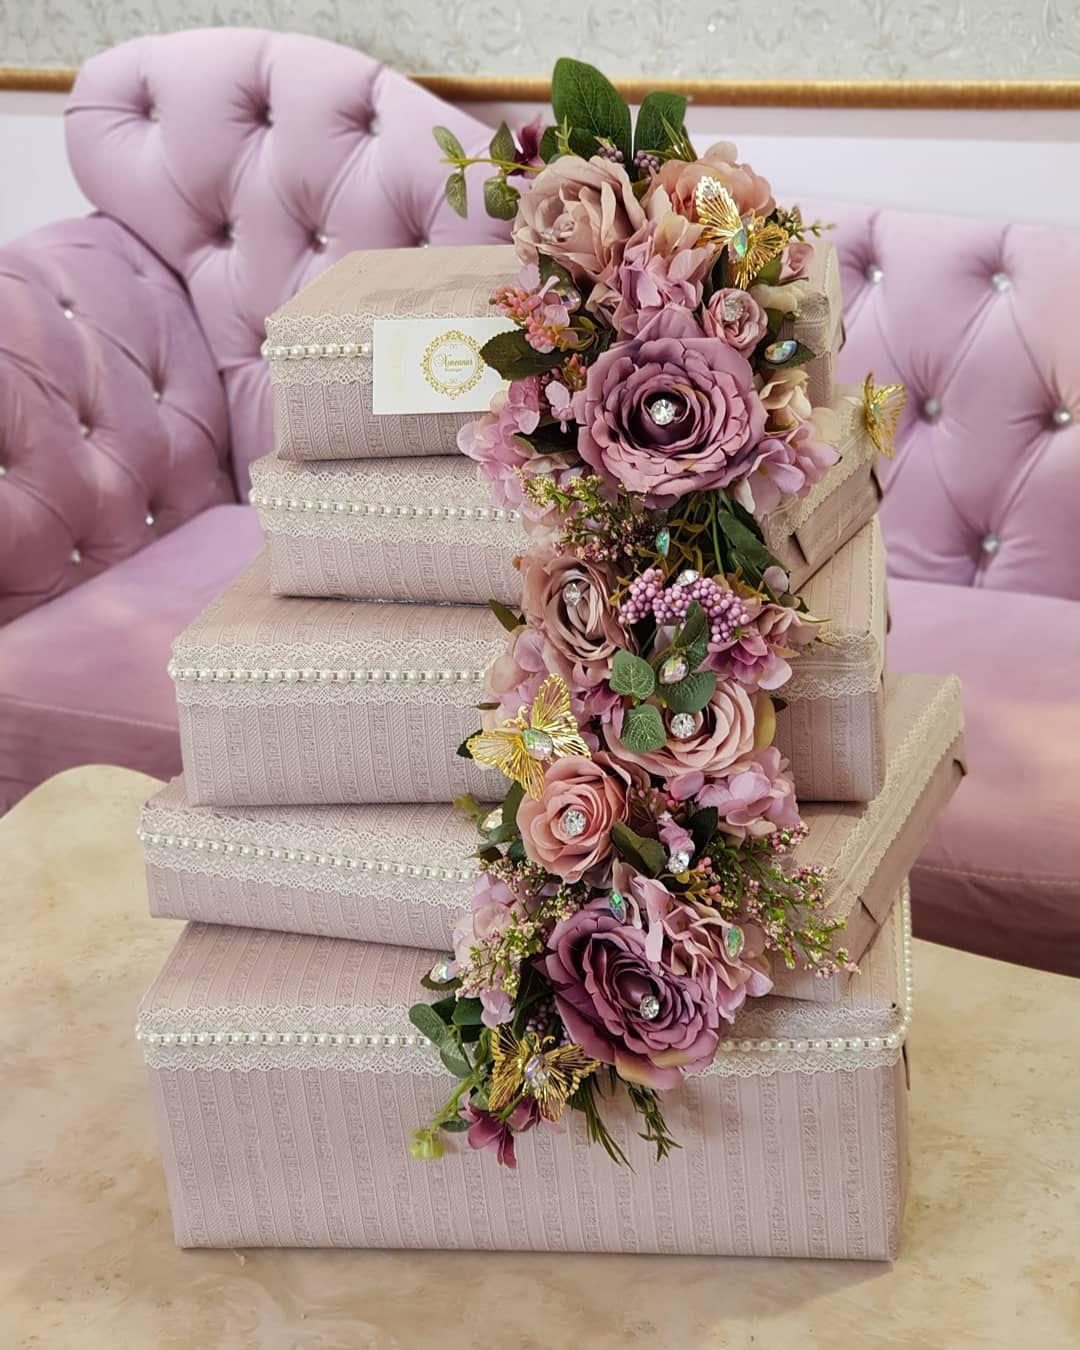 Azerbaycan Aztagram Instagram Xoncanur Xoncaha Heri Nishan Xina Hediyye Wedding Gift Pack Rose Wedding Theme Wedding Gift Boxes